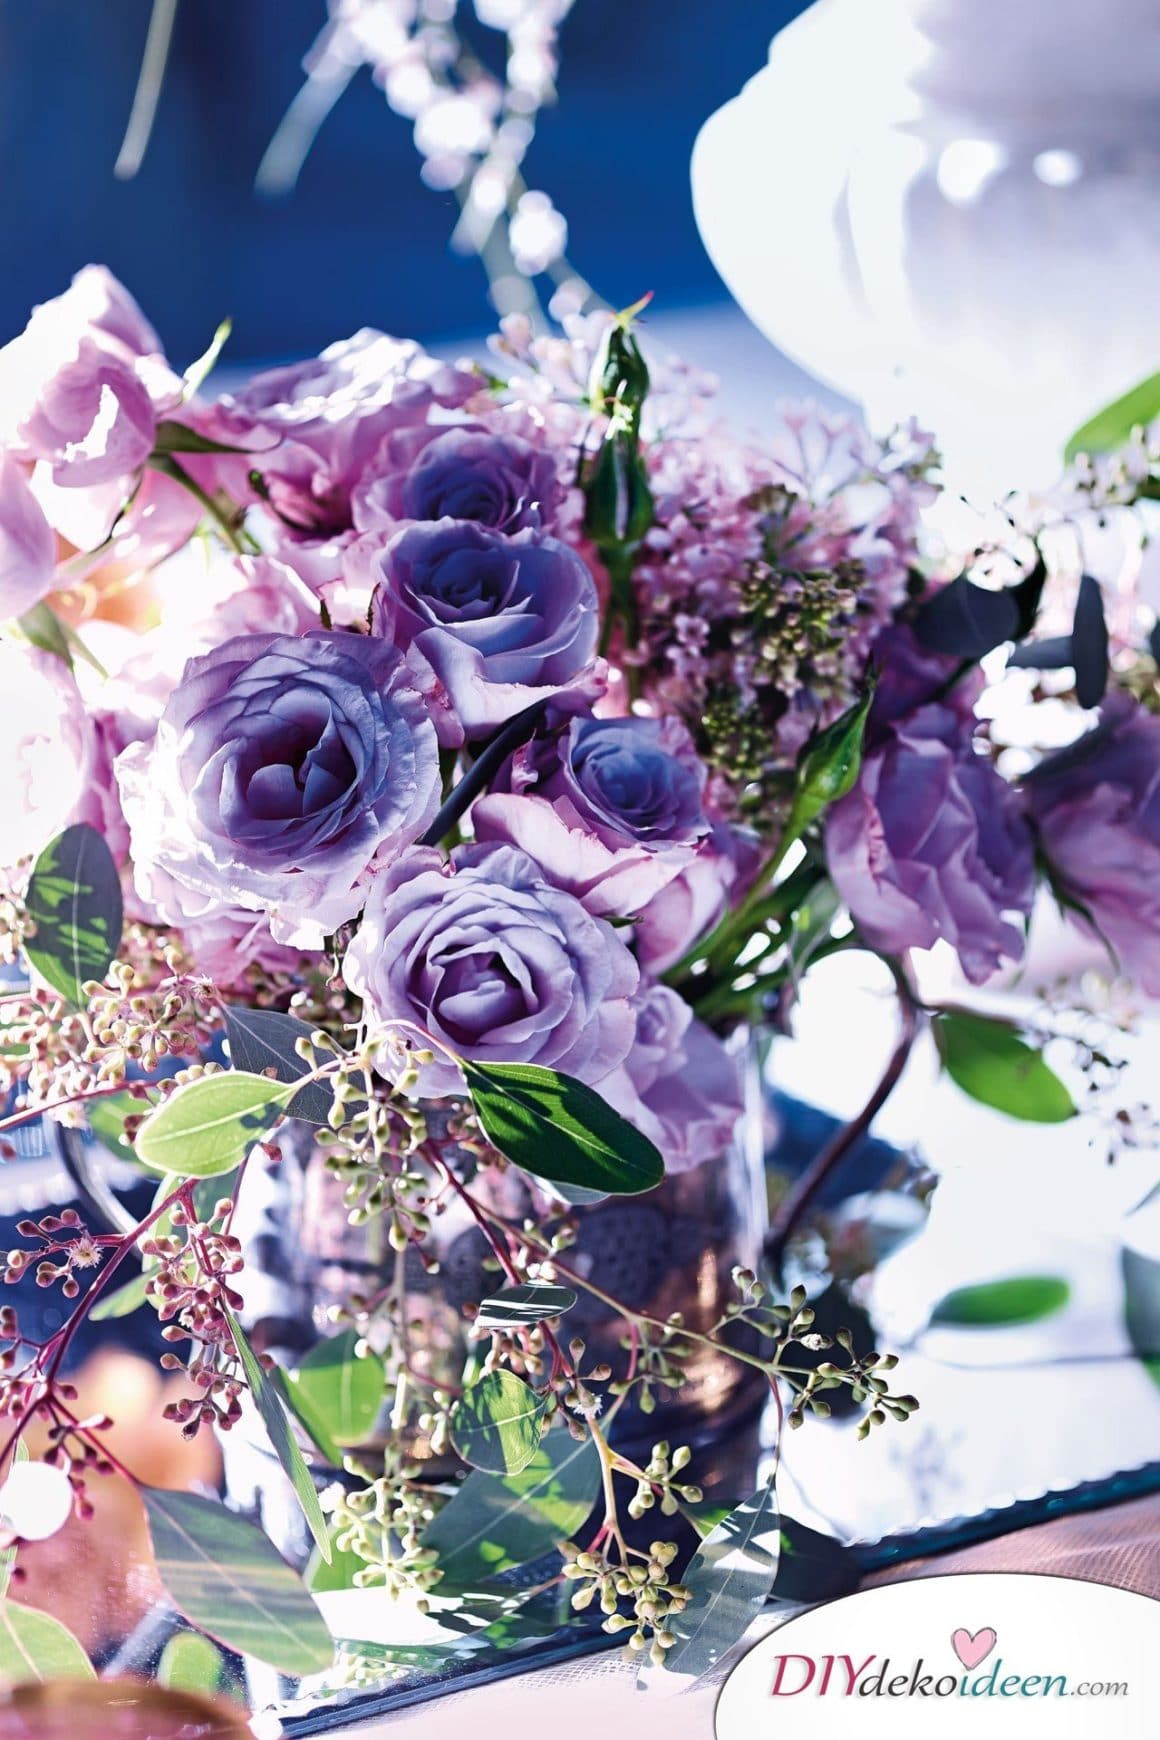 DIY Hochzeitsdeko Ideen, Trendfarbe Lila, lila Hochzeit, lila Hochzeitskleid, Hochzeitsdeko, Hochzeit, Frühlingshochzeit, Hochzeit im Frühling, DIY Dekoideen, Hochzeit, Frühling, Hochzeitsdeko, Hochzeit dekorieren, heiraten, Blumendeko, Hochzeit Dekoideen